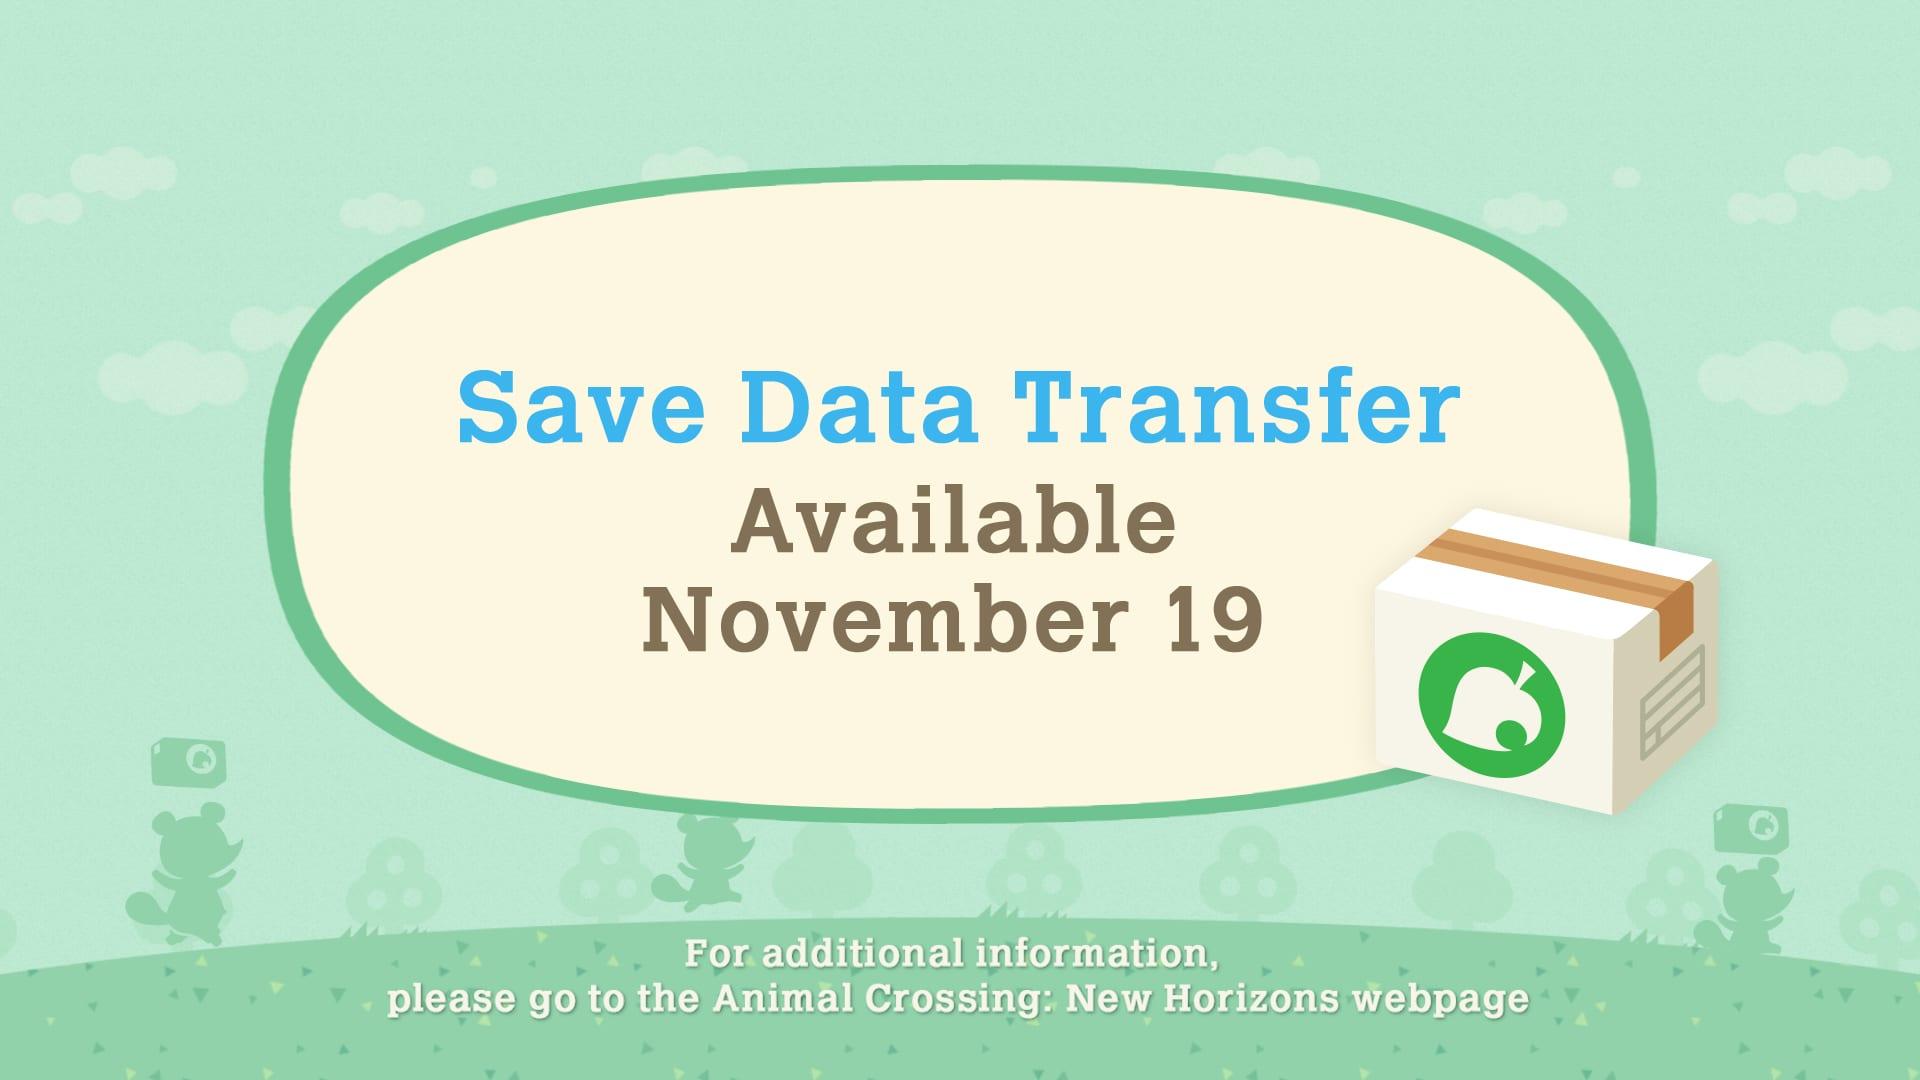 save data transfer